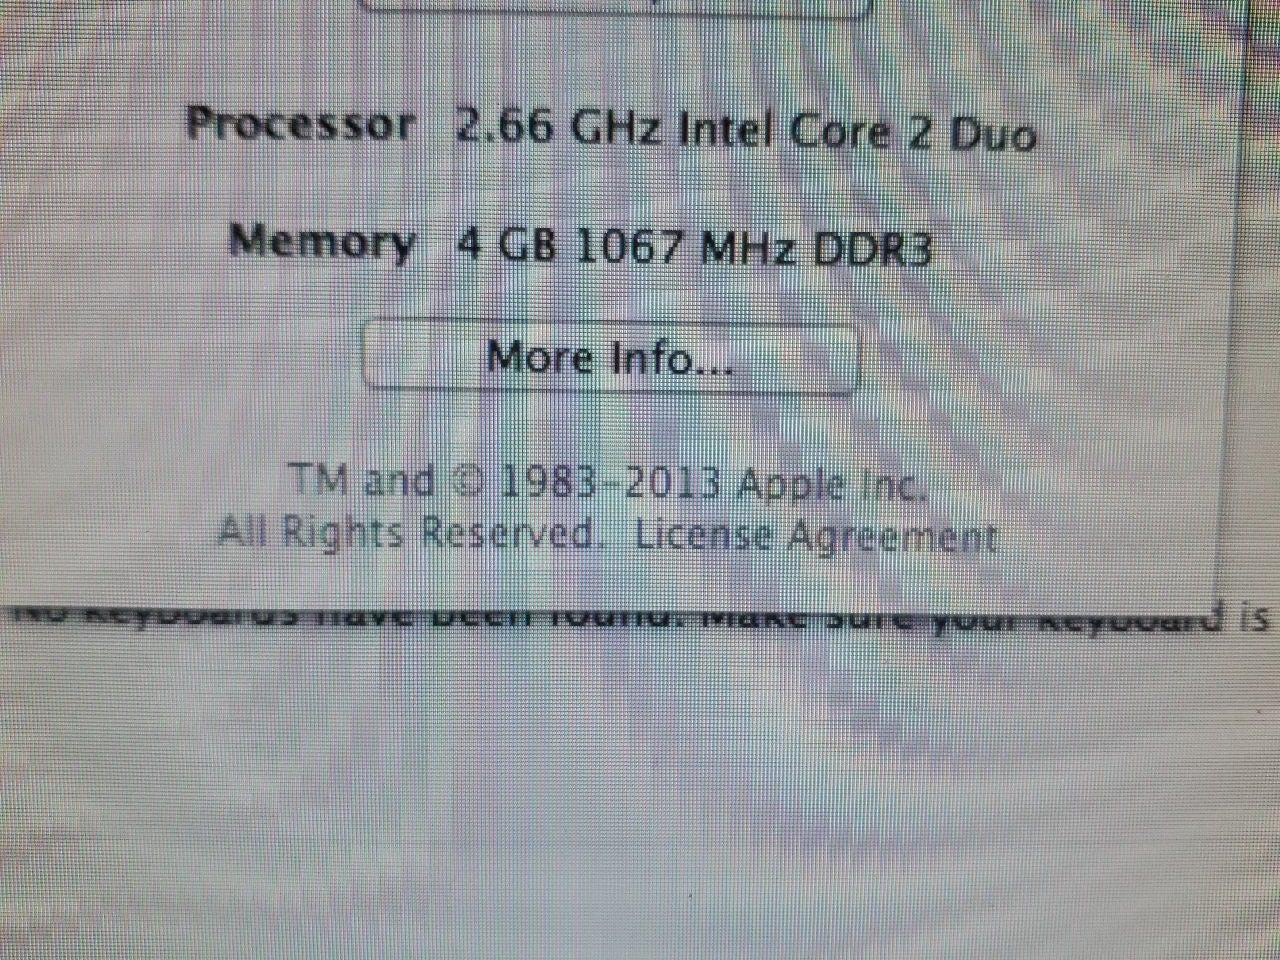 Apple imac a1224 2.66 4g 320G Superdrive